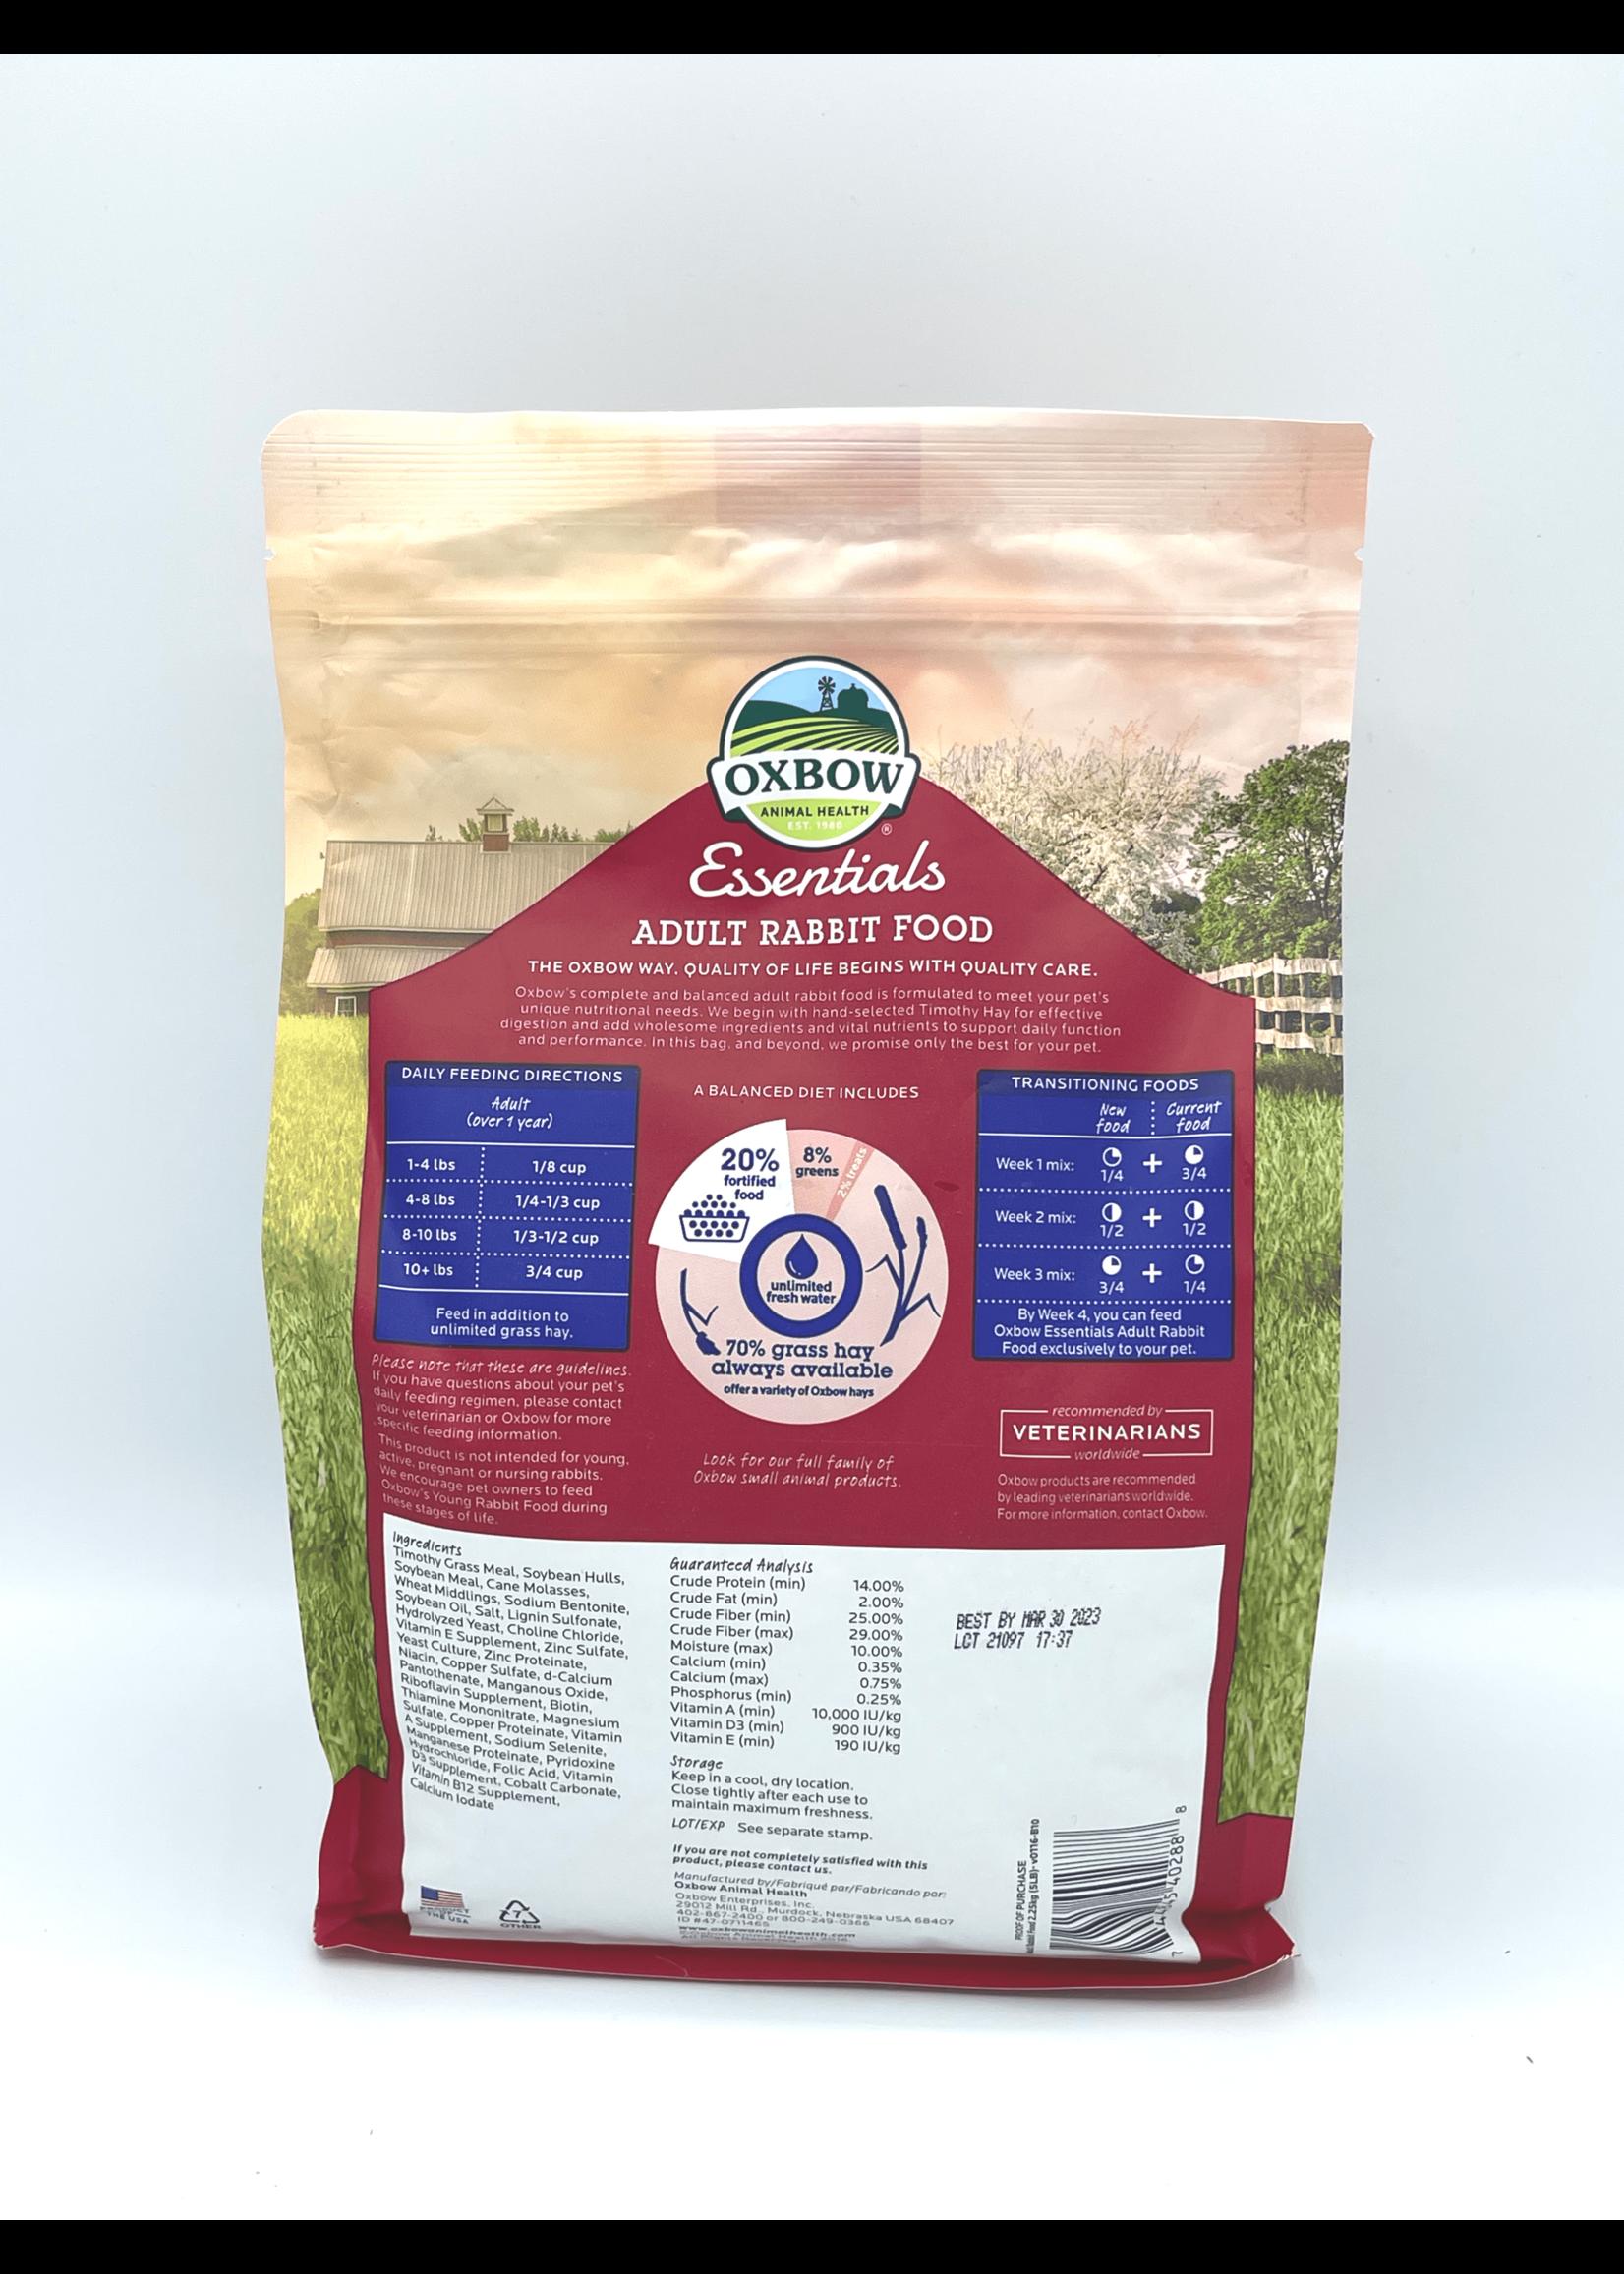 Oxbow Oxbow Essentials Adult Rabbit Food, 5lb bag